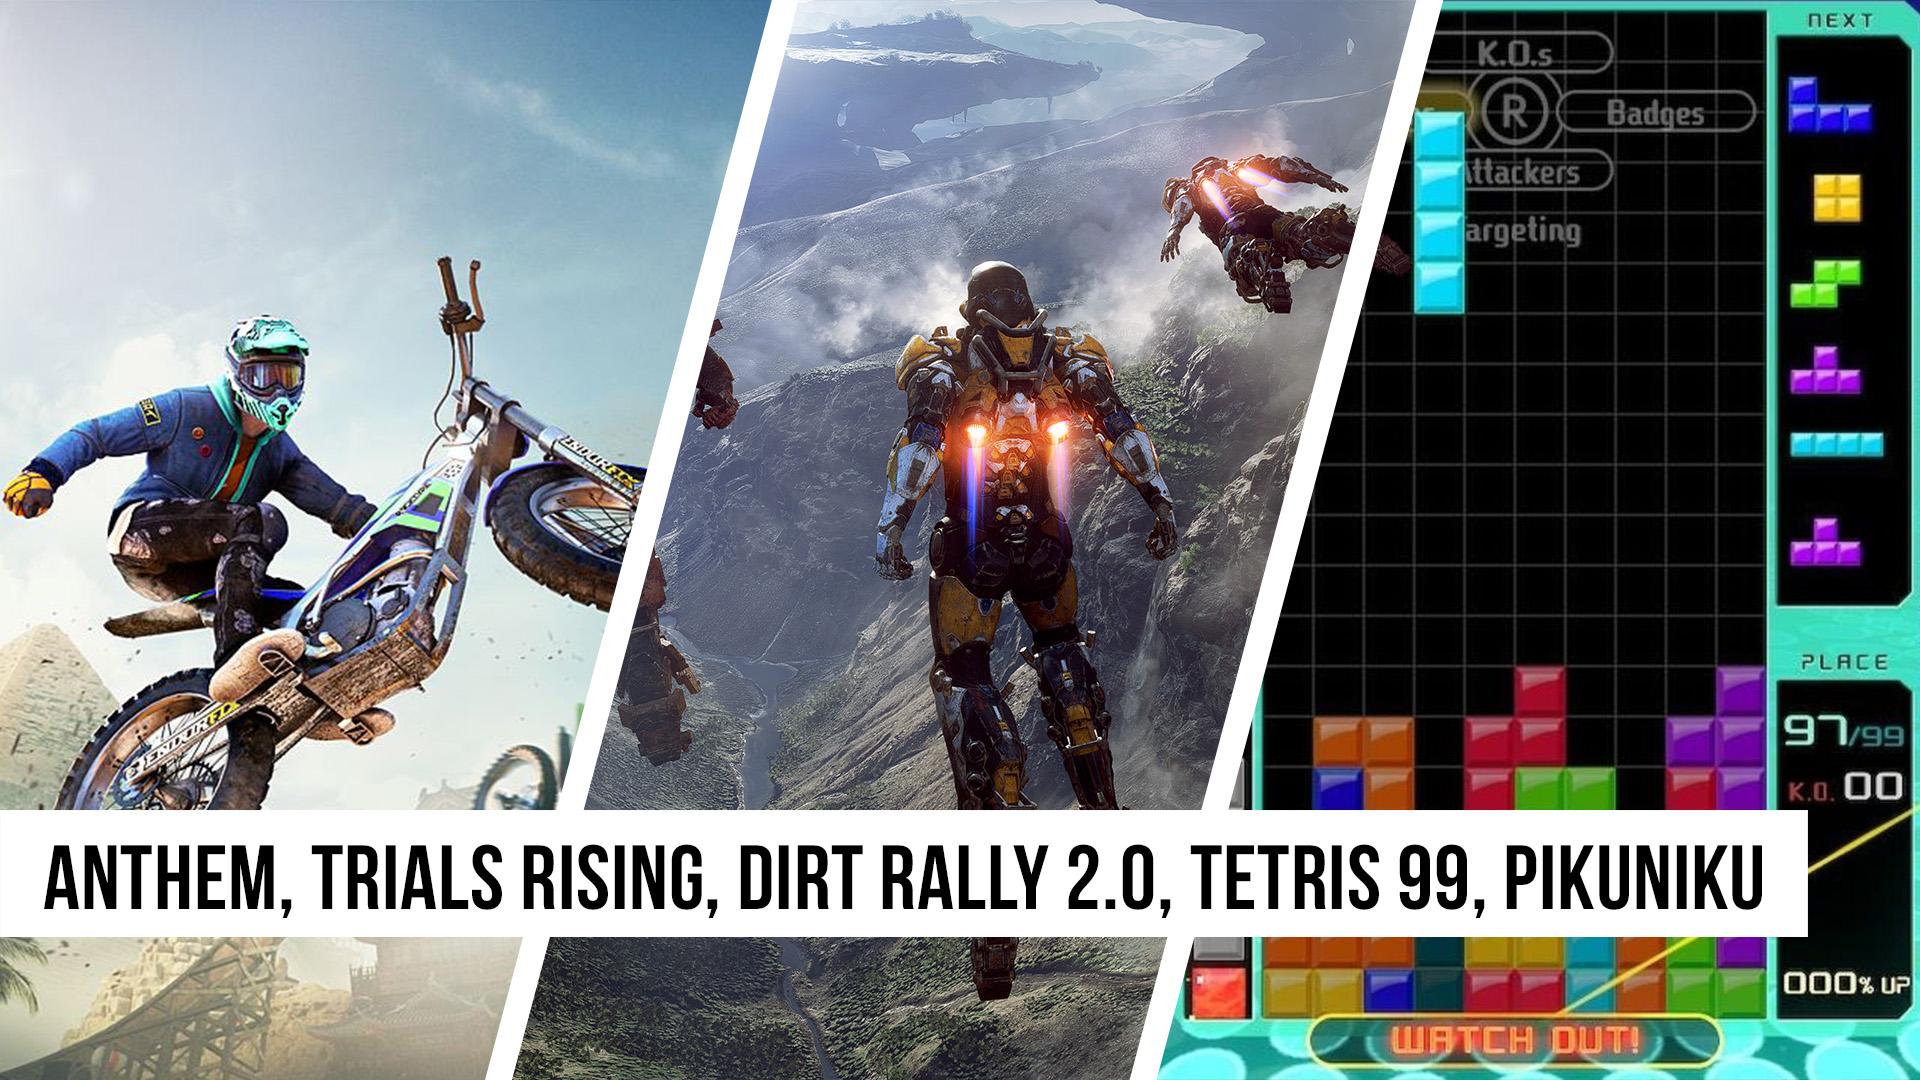 Anthem, Trials Rising, Dirt Rally 2.0, Tetris 99, Pikuniku | Game Two #105